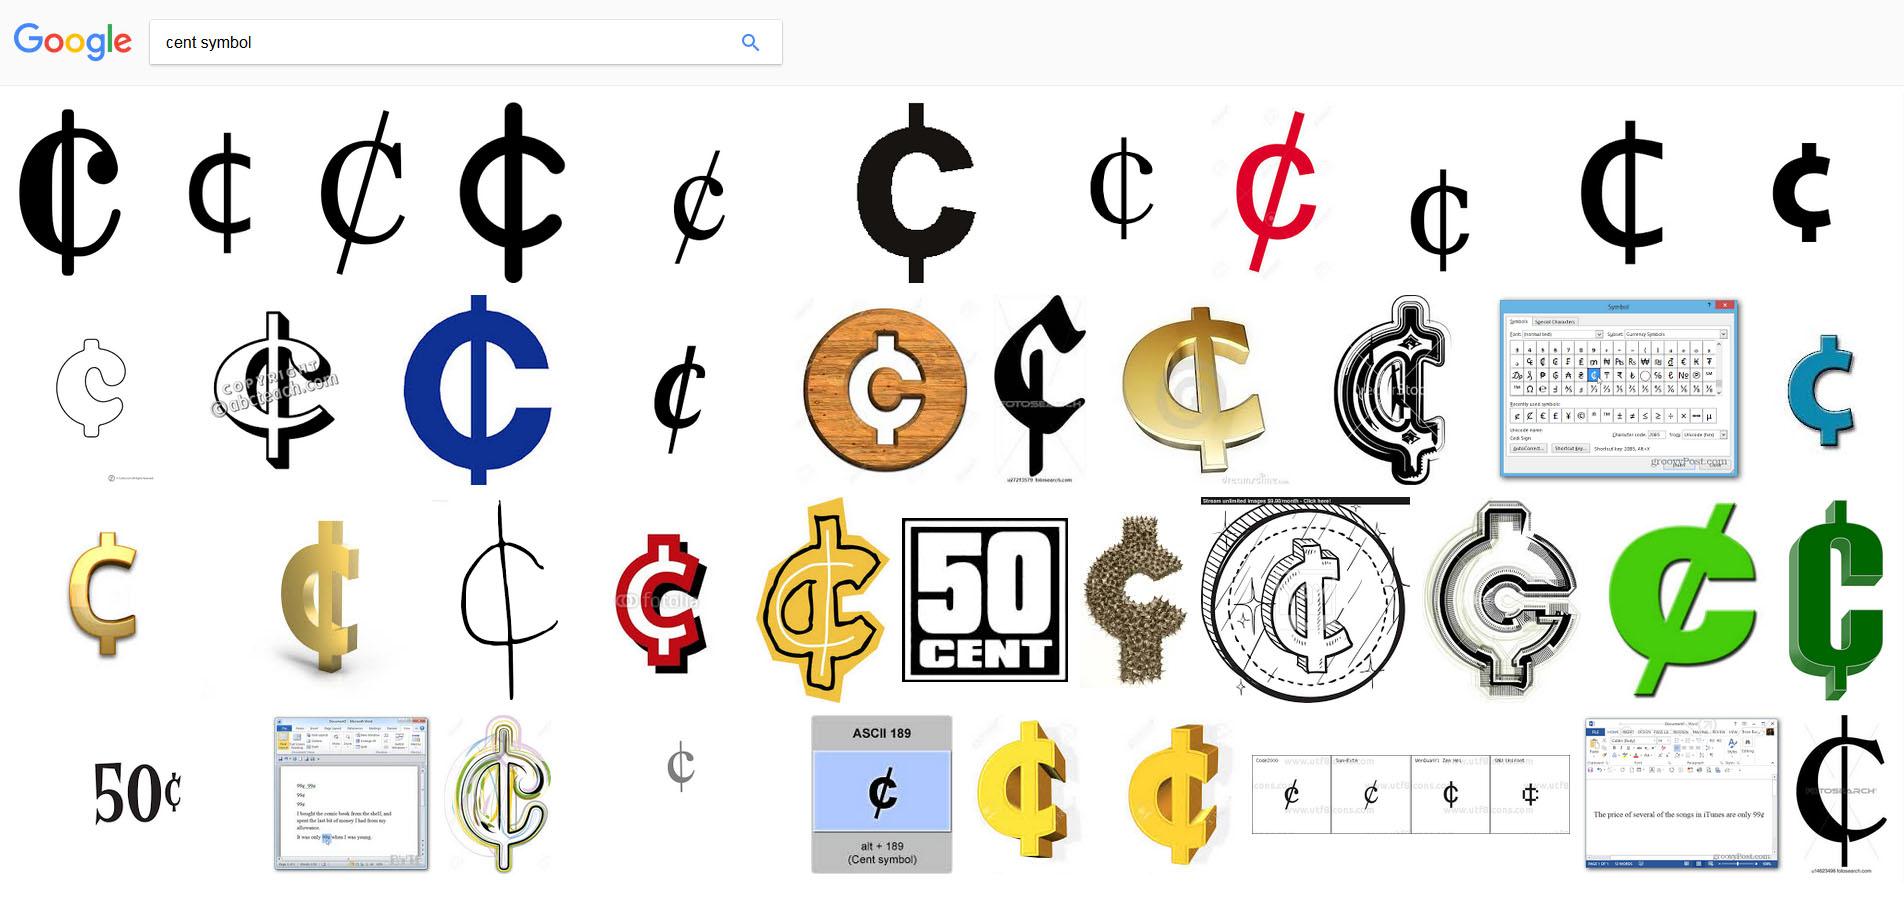 Polish zoty symbol the dialogue en61 polish zoty symbol14 buycottarizona Image collections